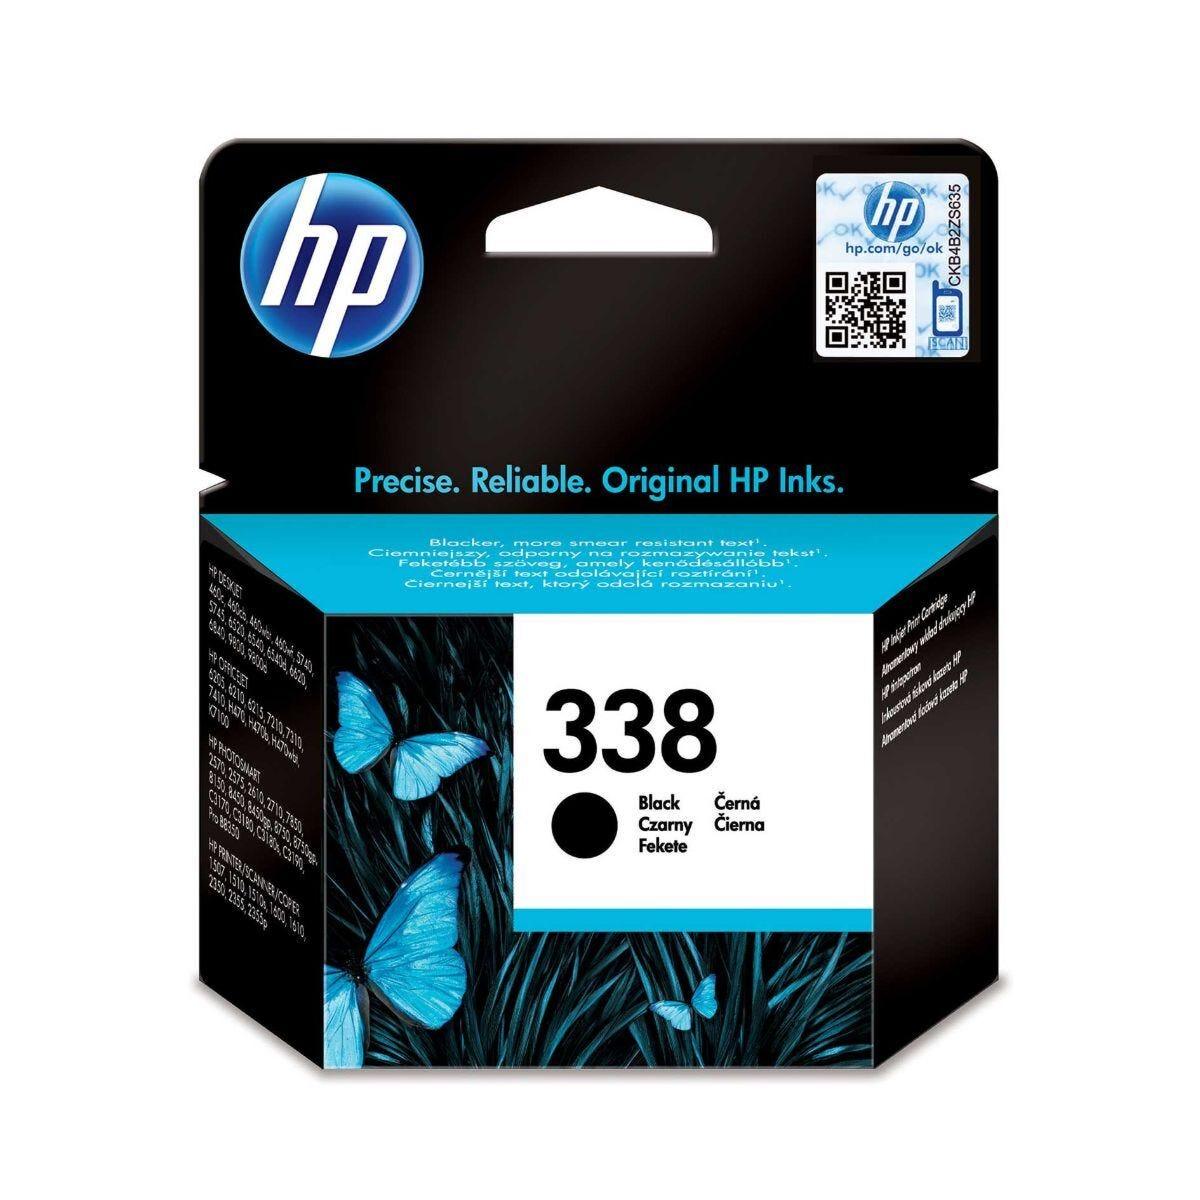 HP 338 Ink Cartridge 11ml